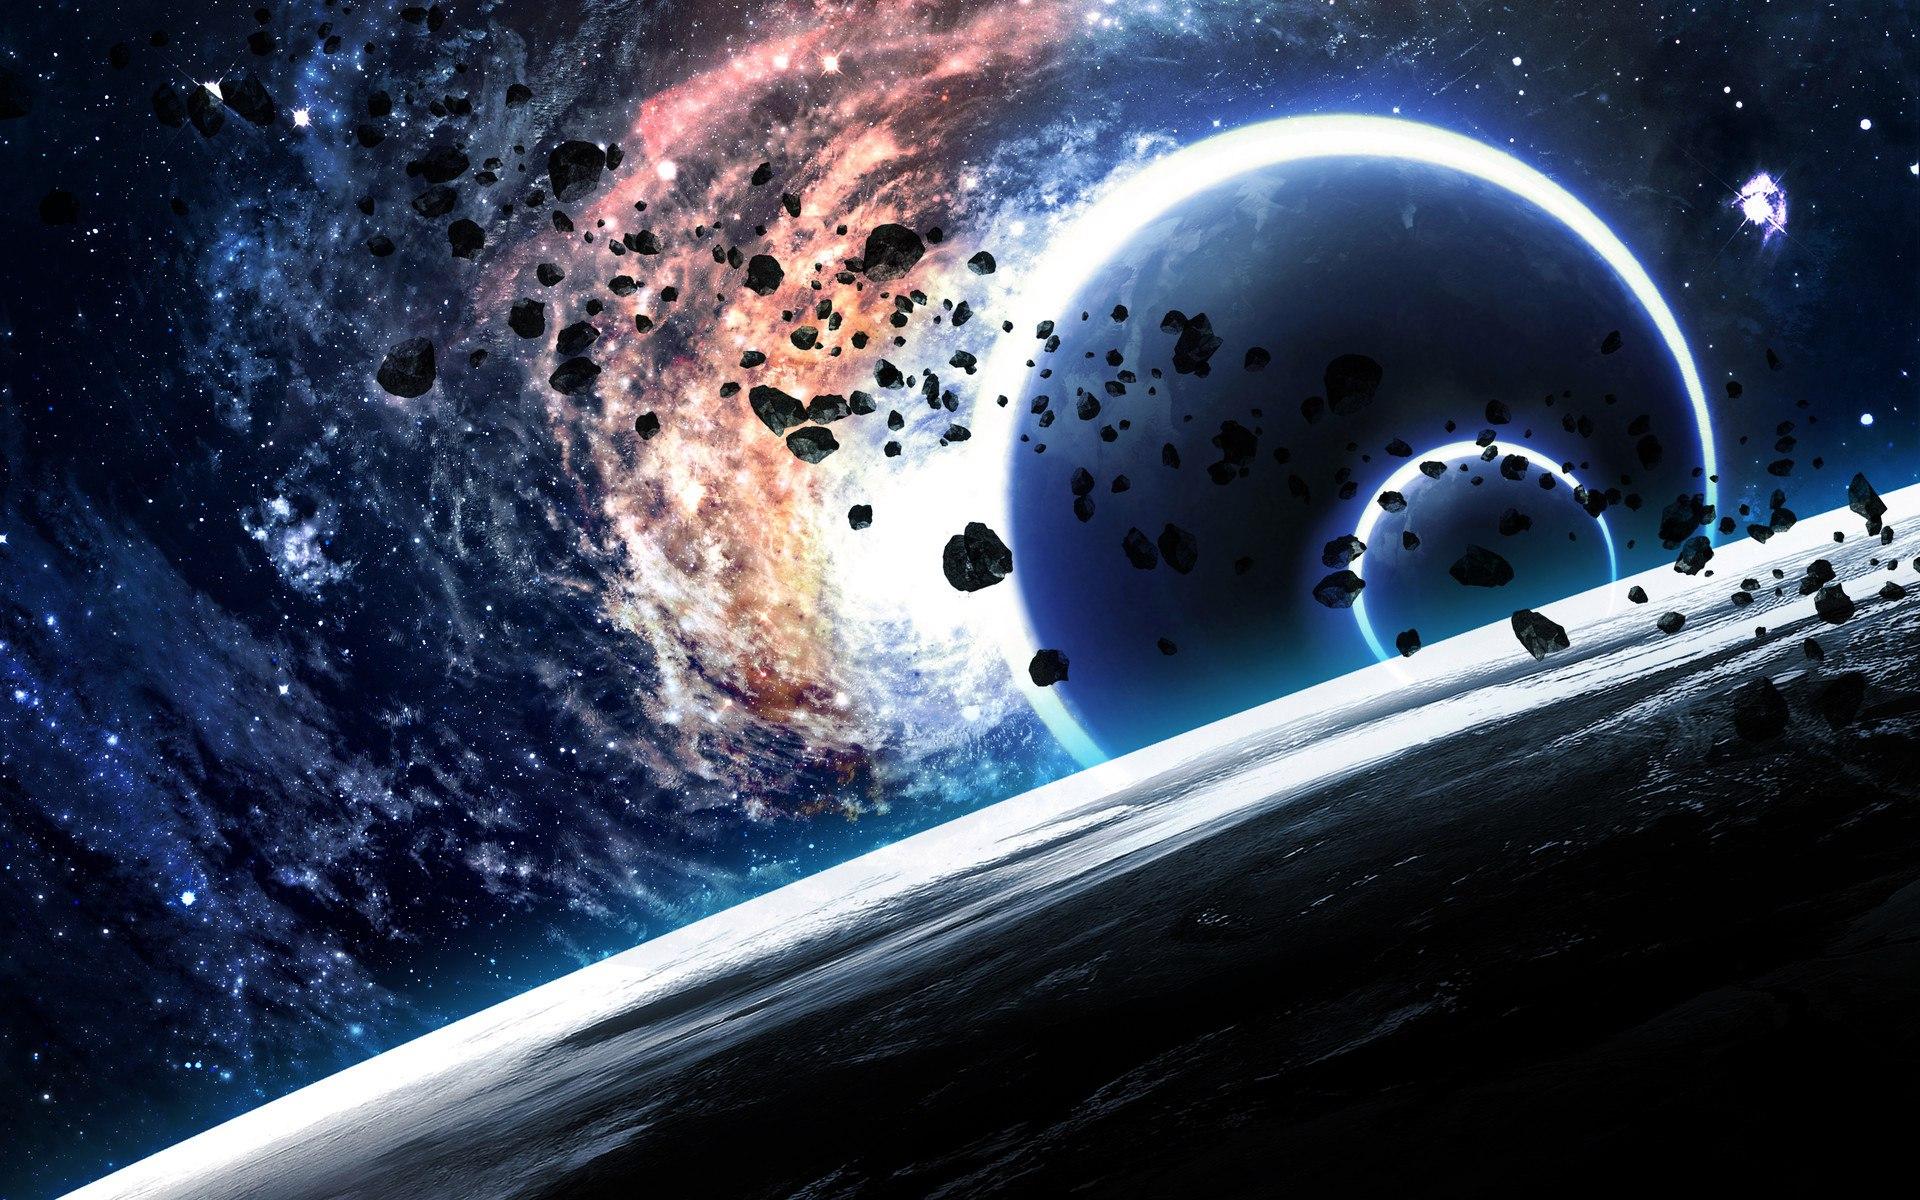 Звёздное небо и космос в картинках - Страница 37 ZnPIl-FId1E